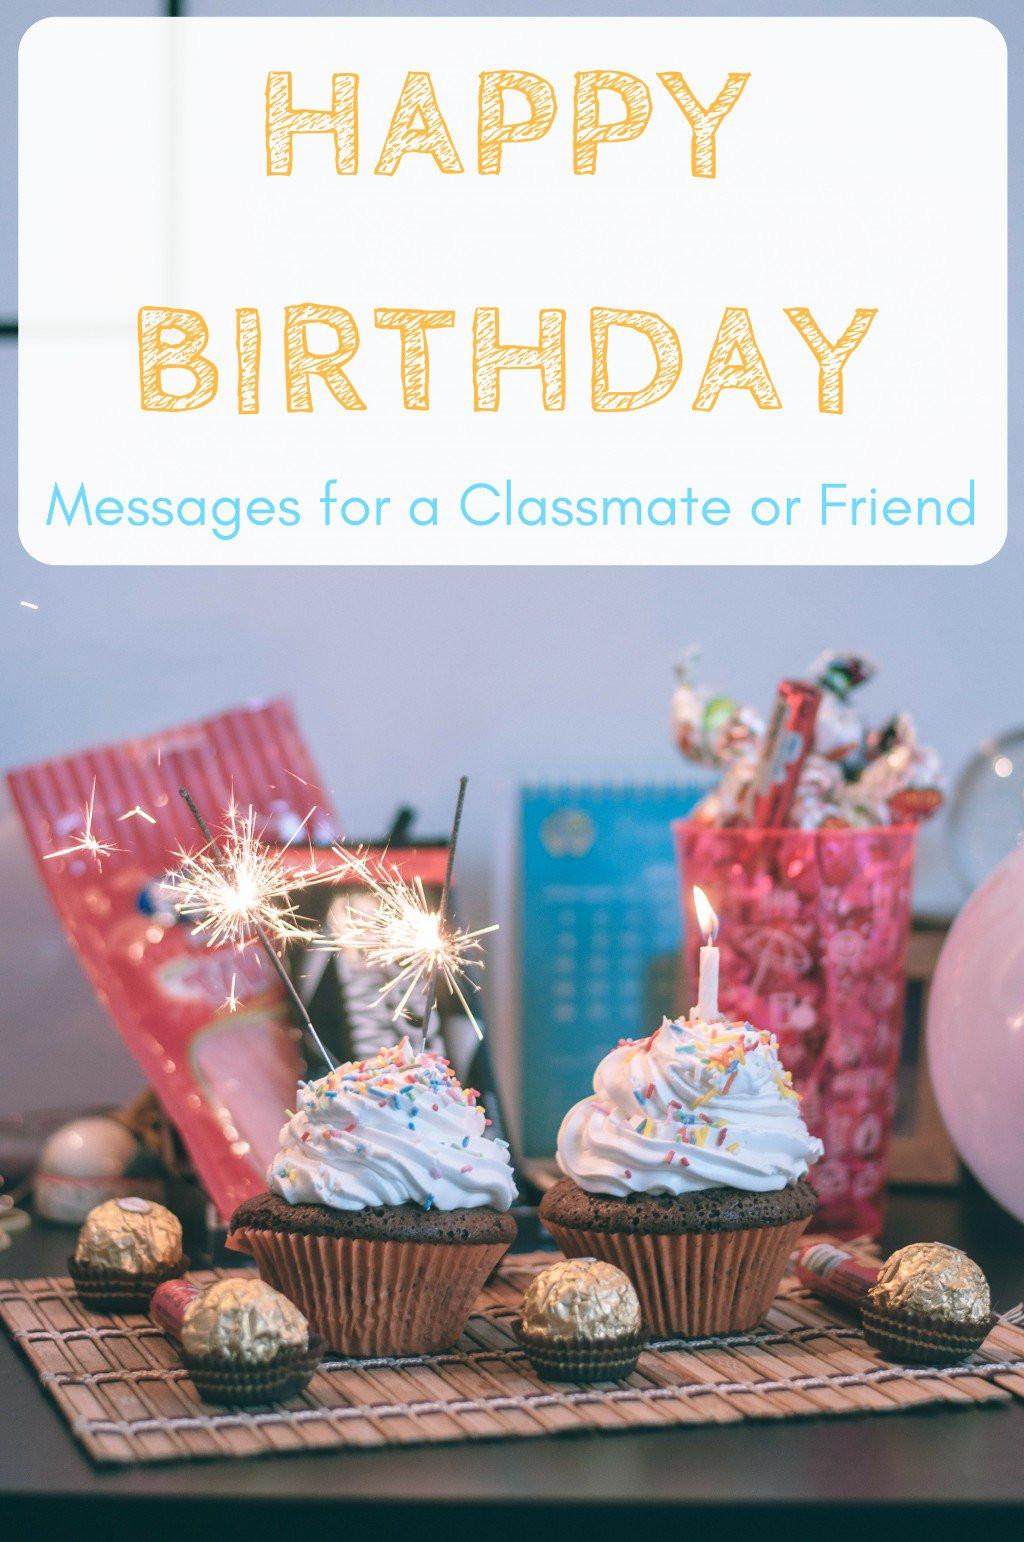 Best ideas about Happy Birthday Wishes Friend . Save or Pin Happy Birthday Wishes for a Classmate School Friend or Now.